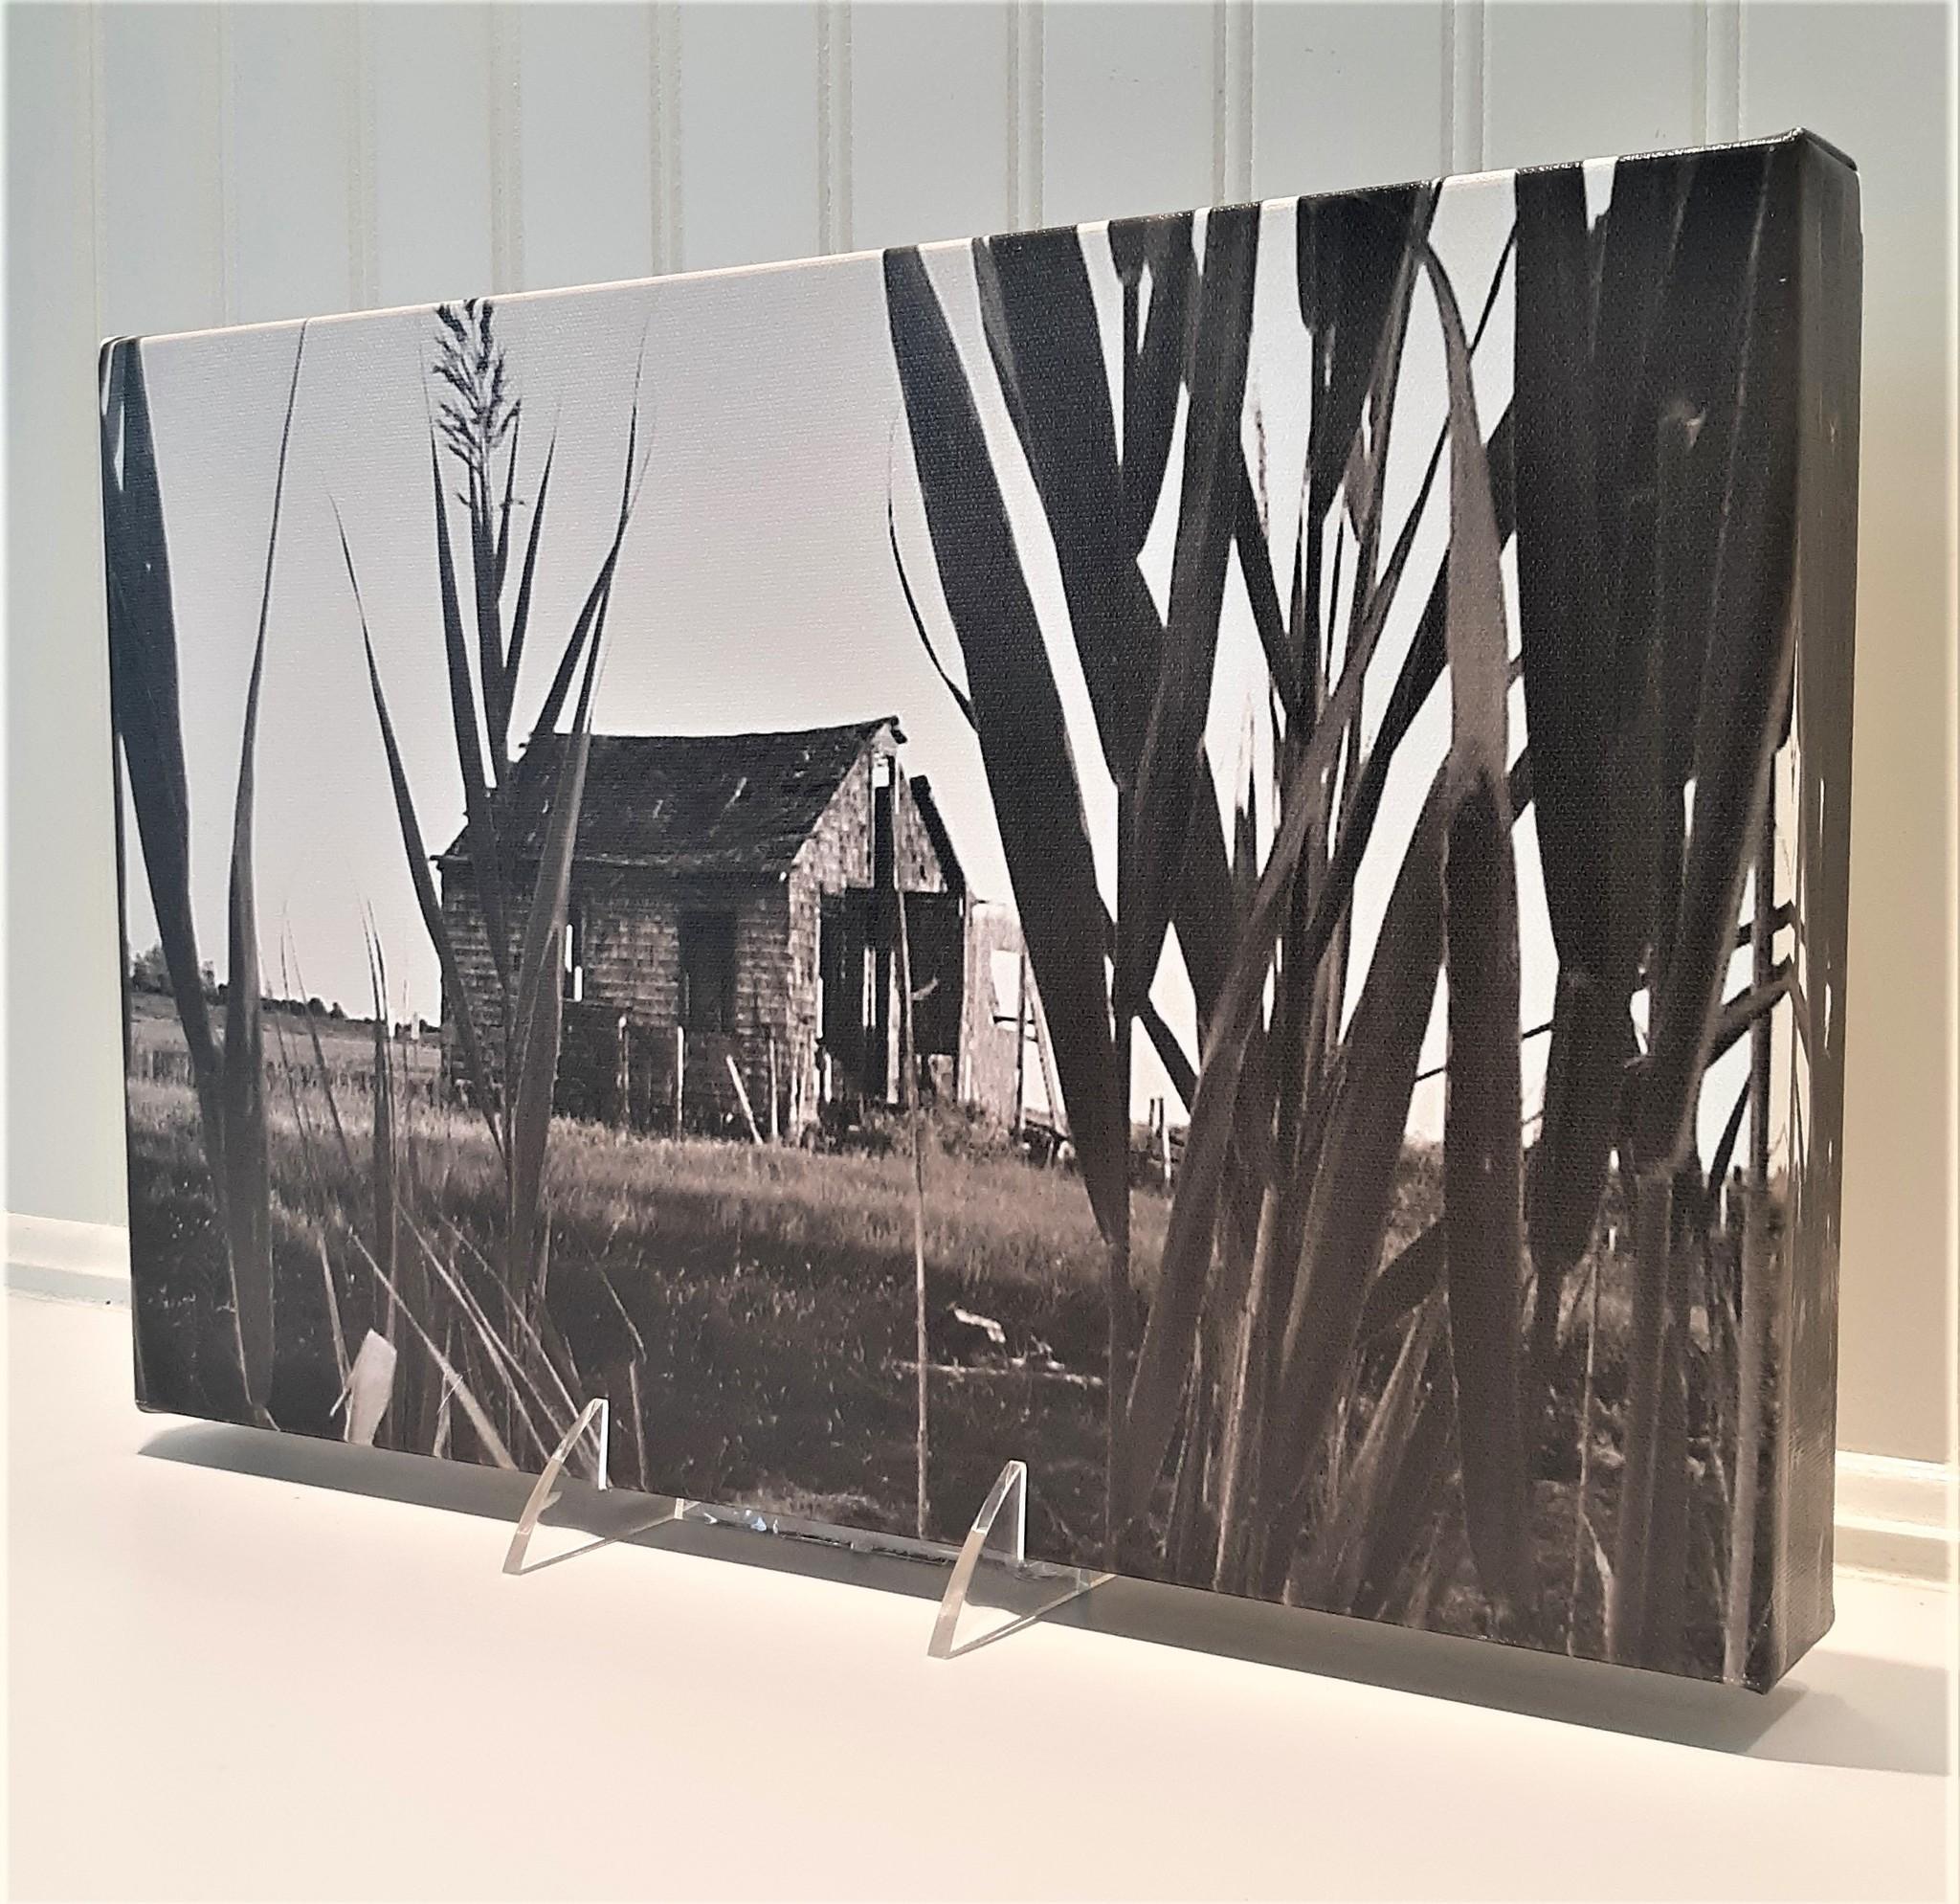 9x14 Shack Sideways Black and White